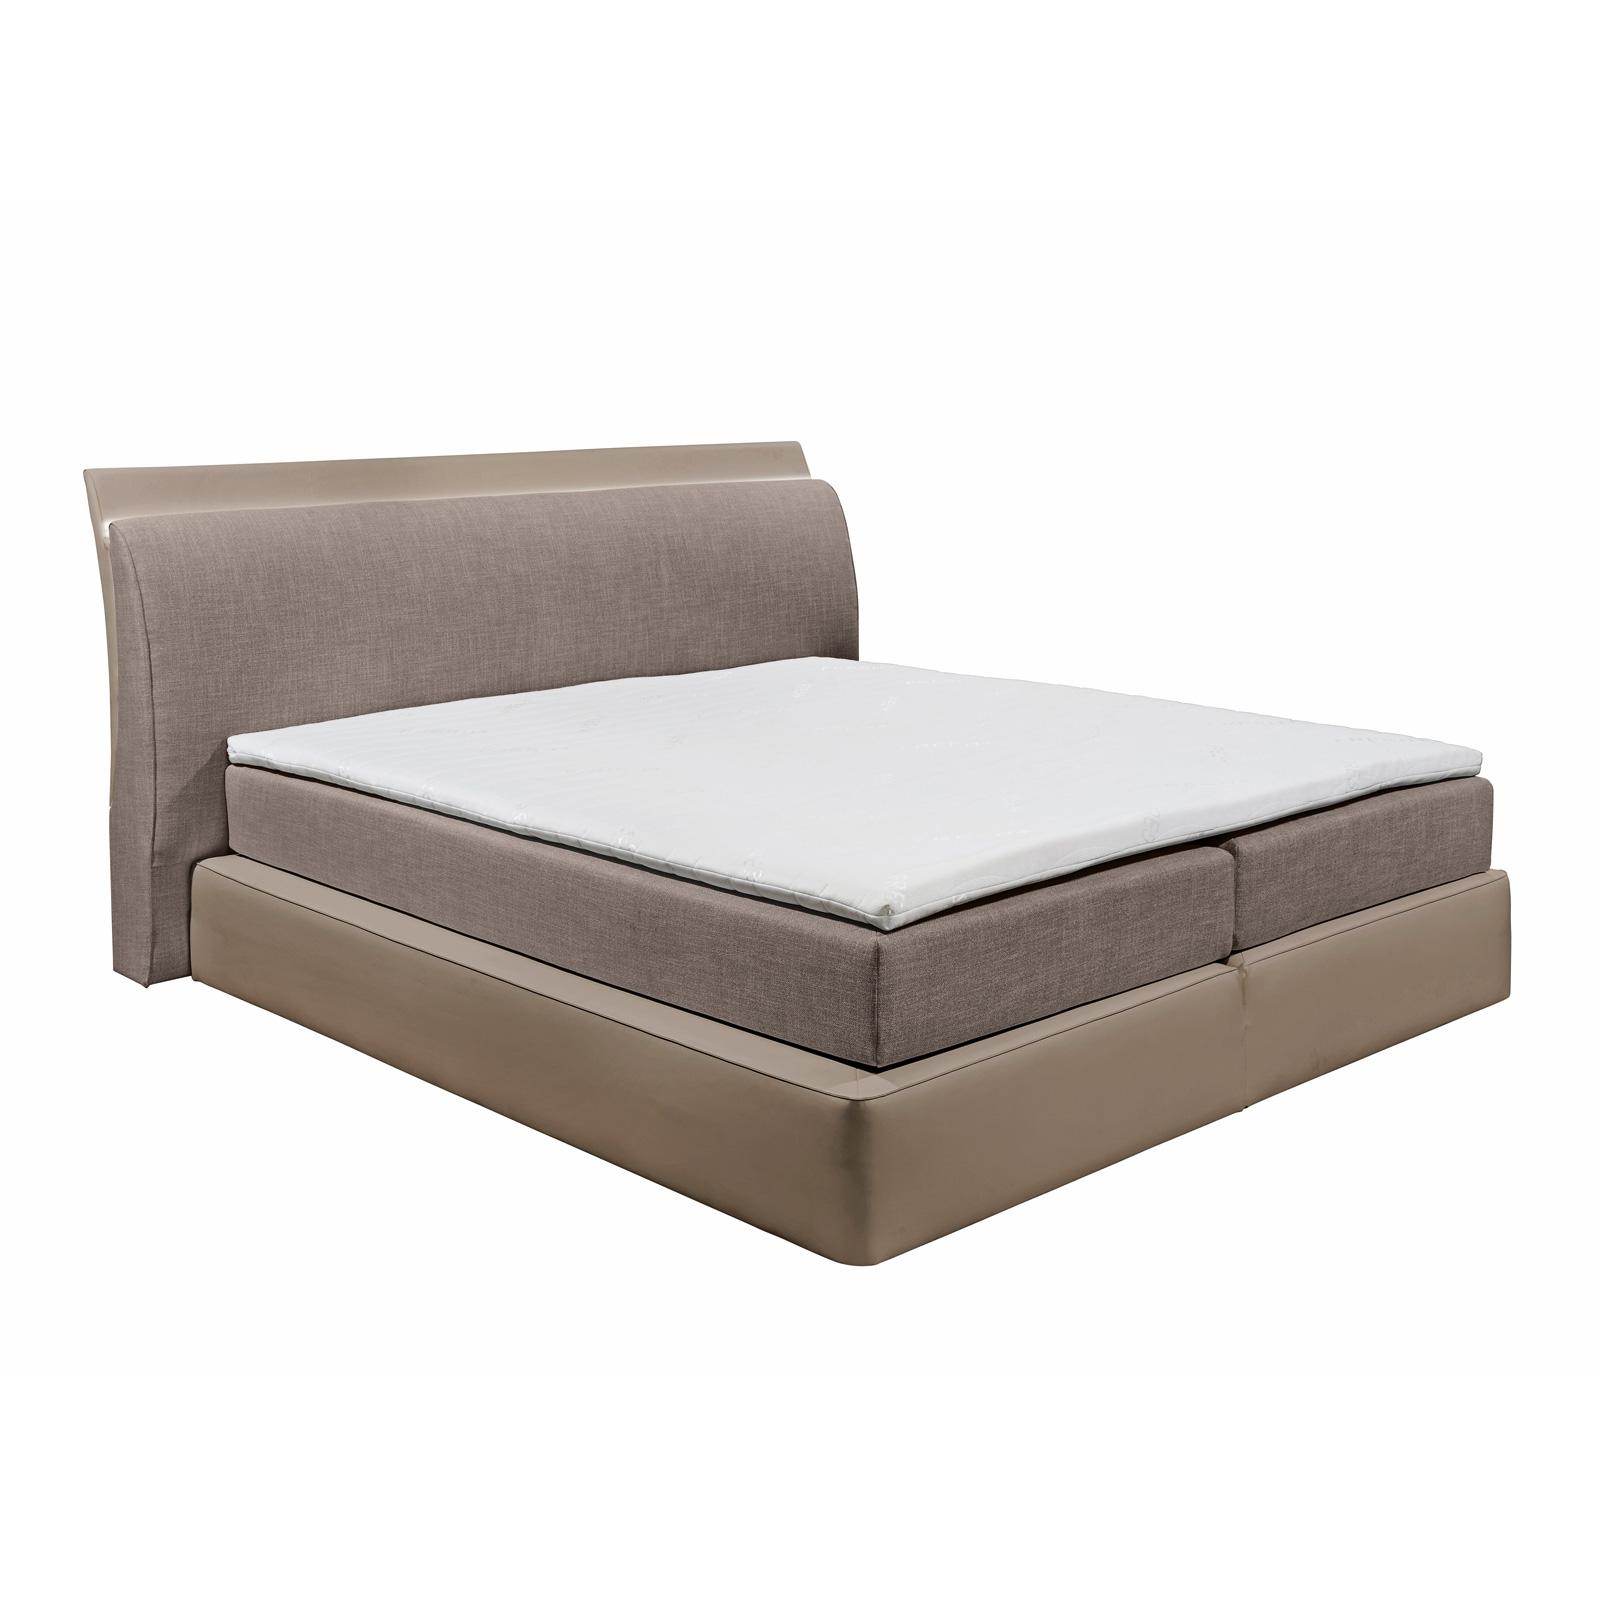 boxspringbett ventura 2 7 zonen mit topper und beleuchtung farbauswahl 180x200 ebay. Black Bedroom Furniture Sets. Home Design Ideas